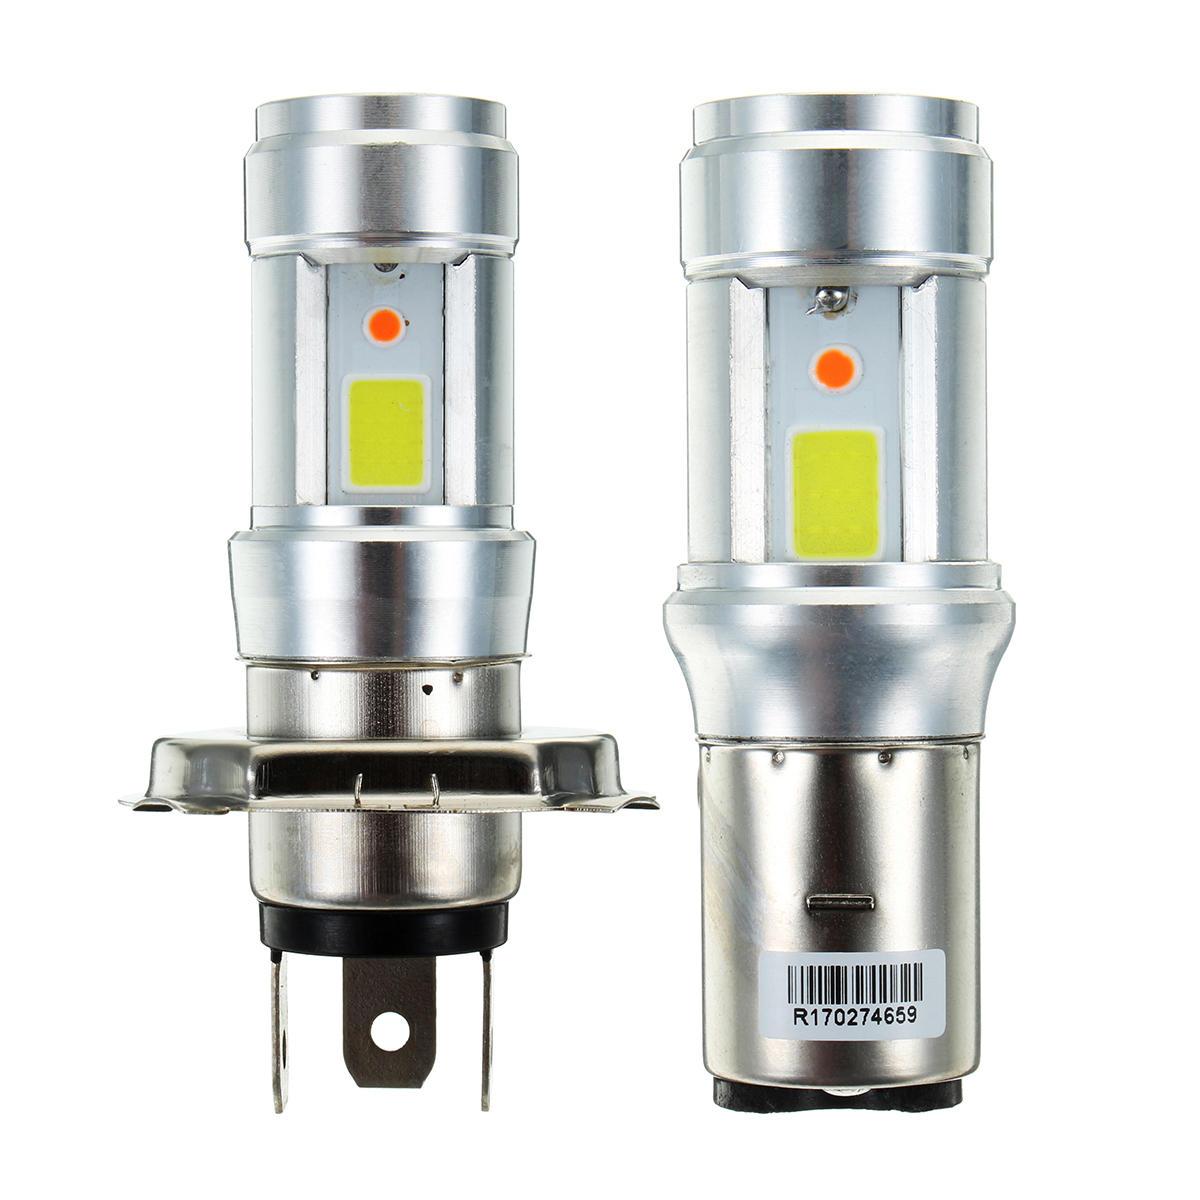 H4 BA20D 3000LM 18W Bright Hi/Lo COB LED Motorcycle Headlamp Motorbike Fog Lamp Light DC9-18V